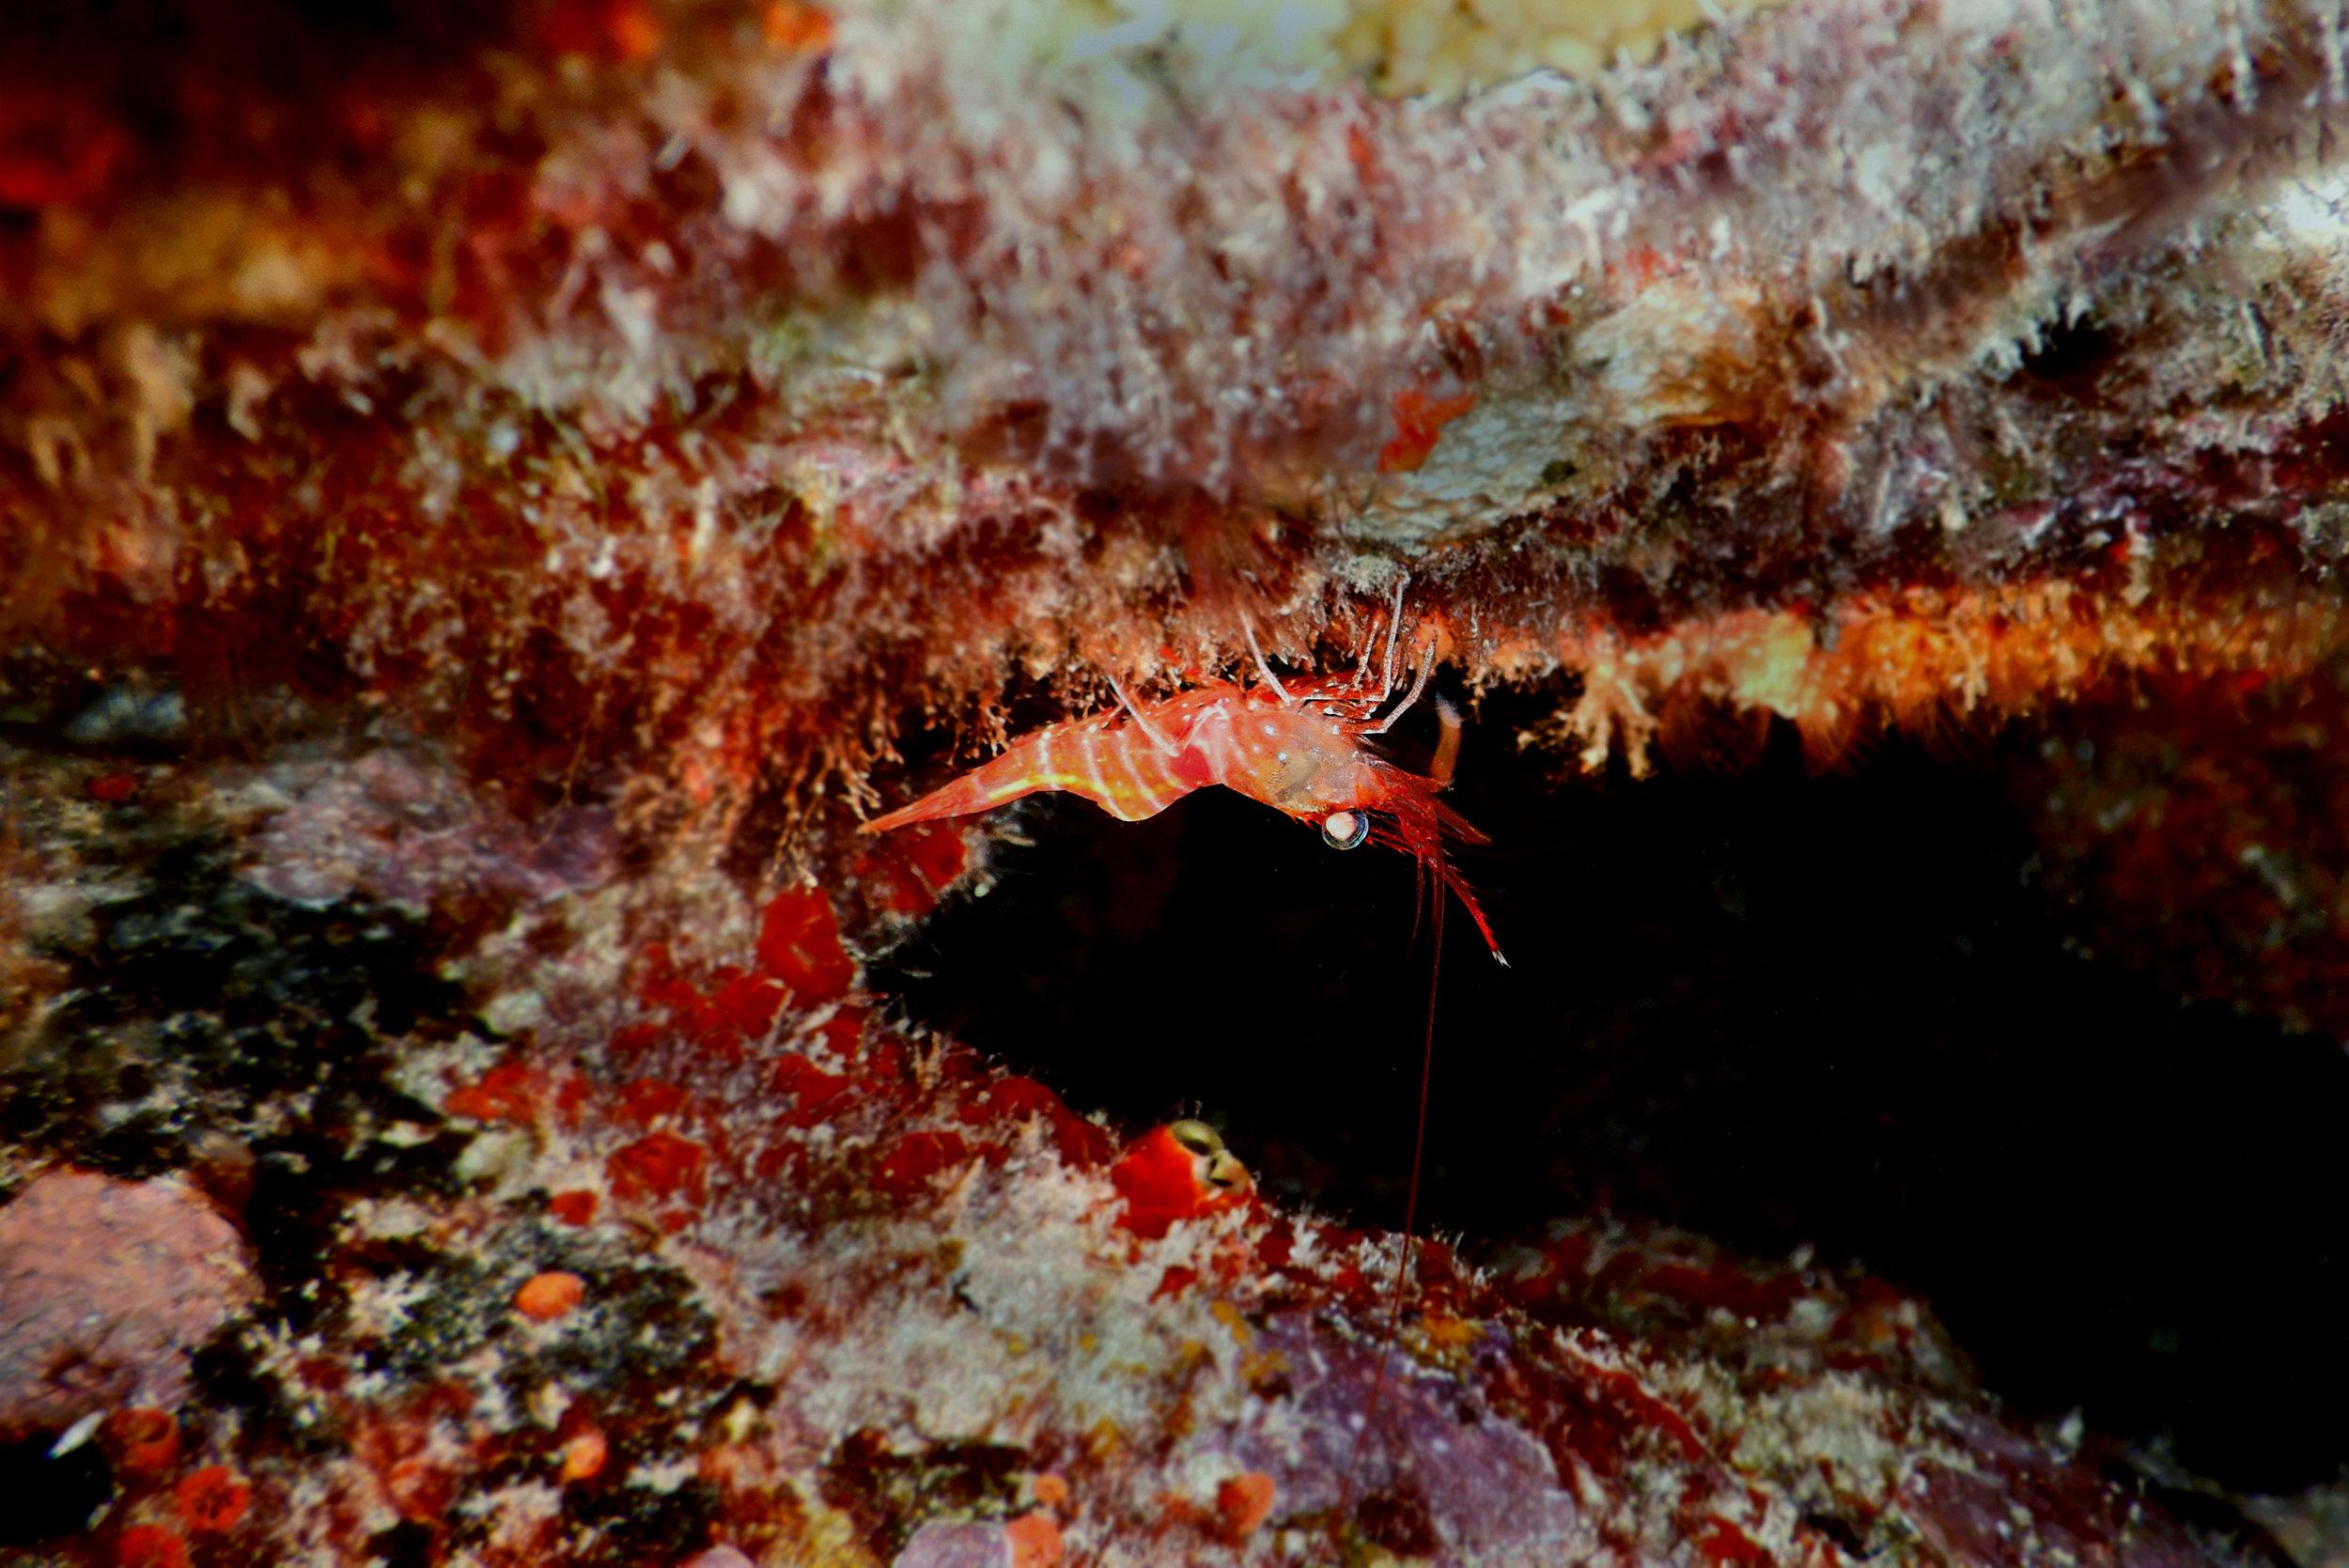 A shrimp picks algae off the underside of an  A. palmata  colony.